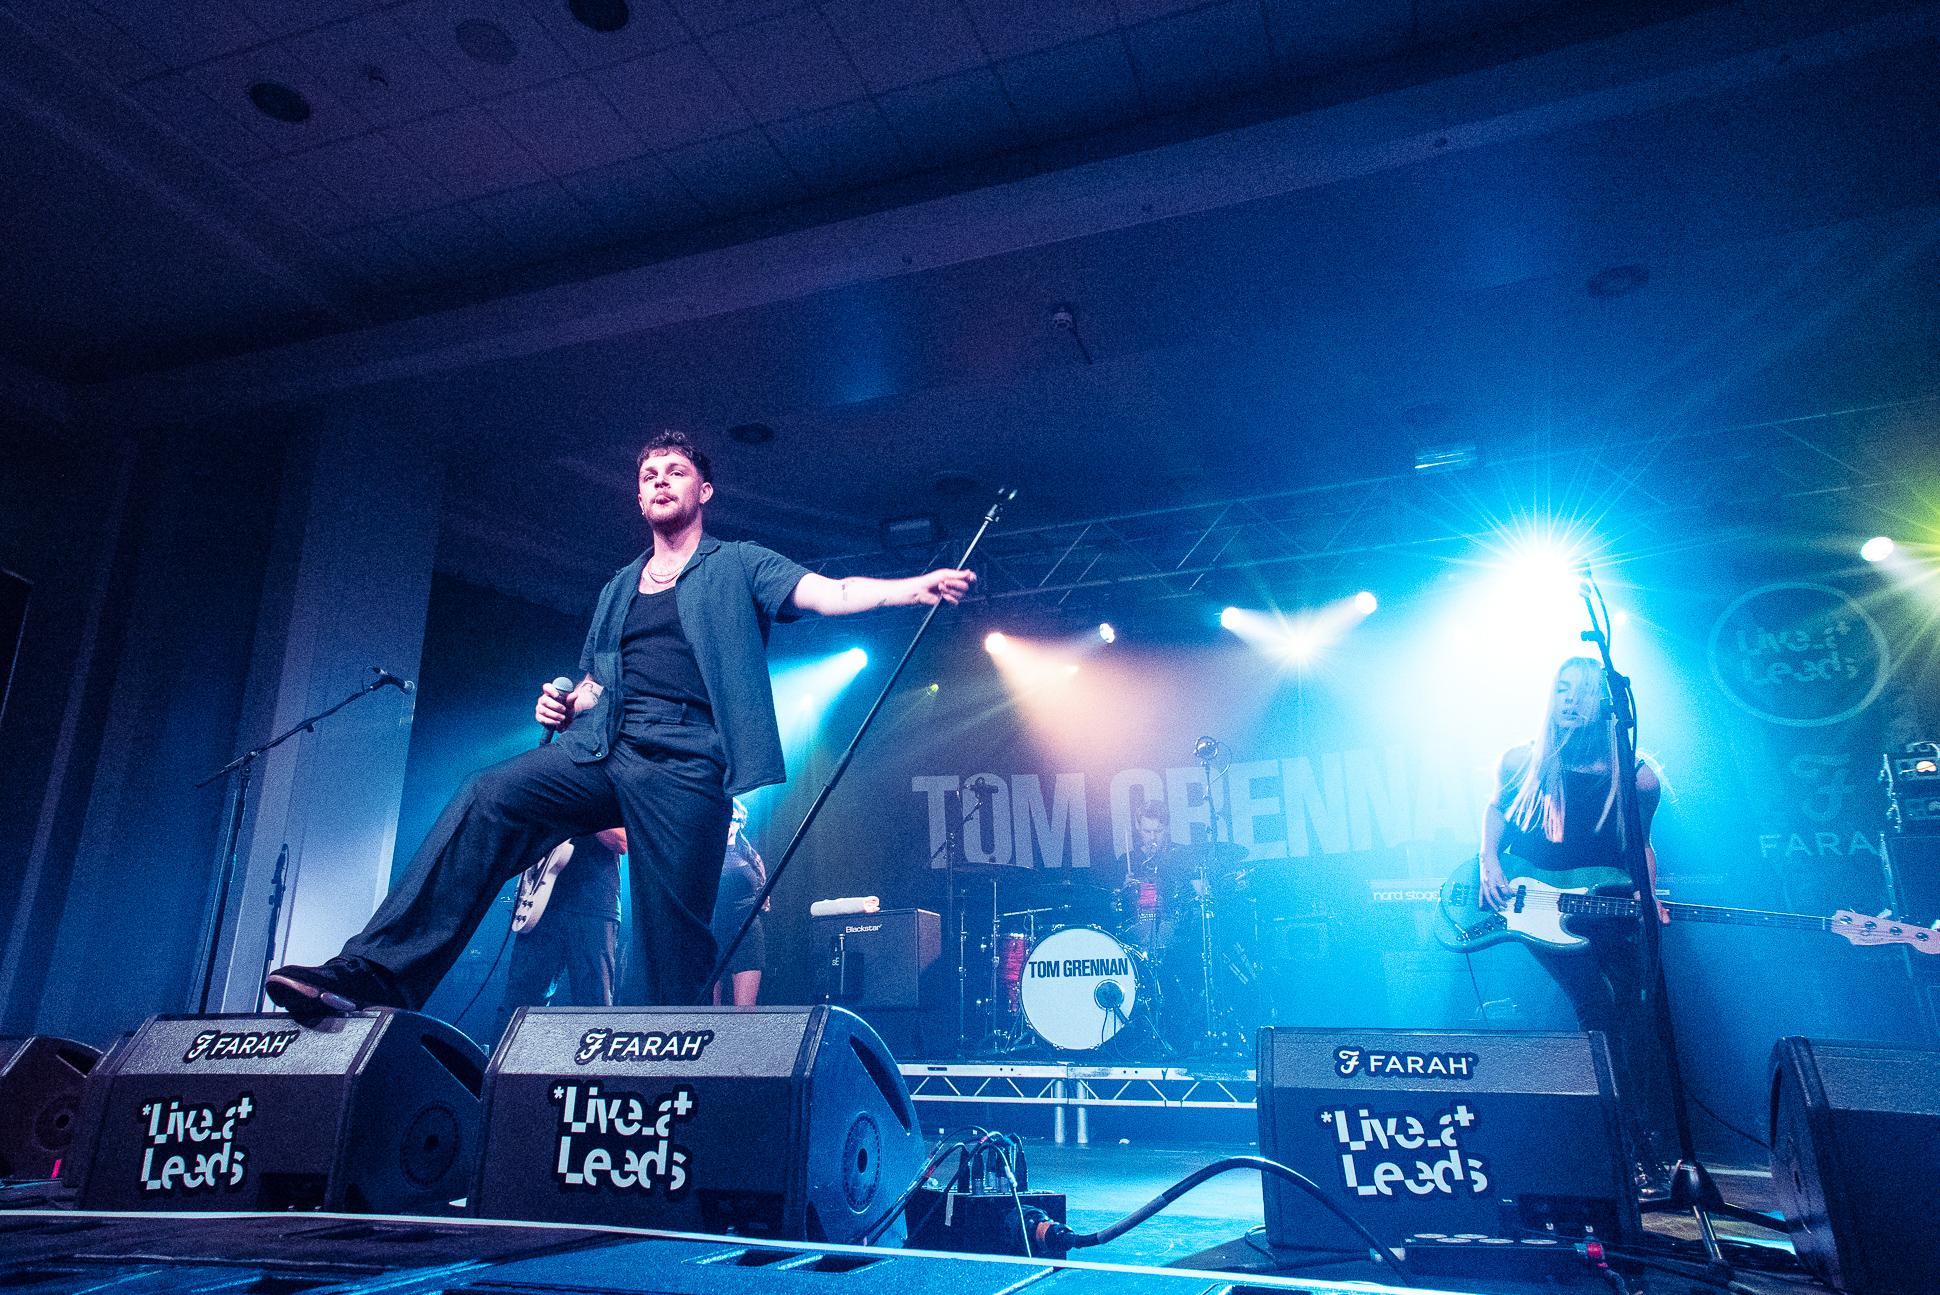 Live At Leeds 2019 - Tom Grennan_-13.jpg